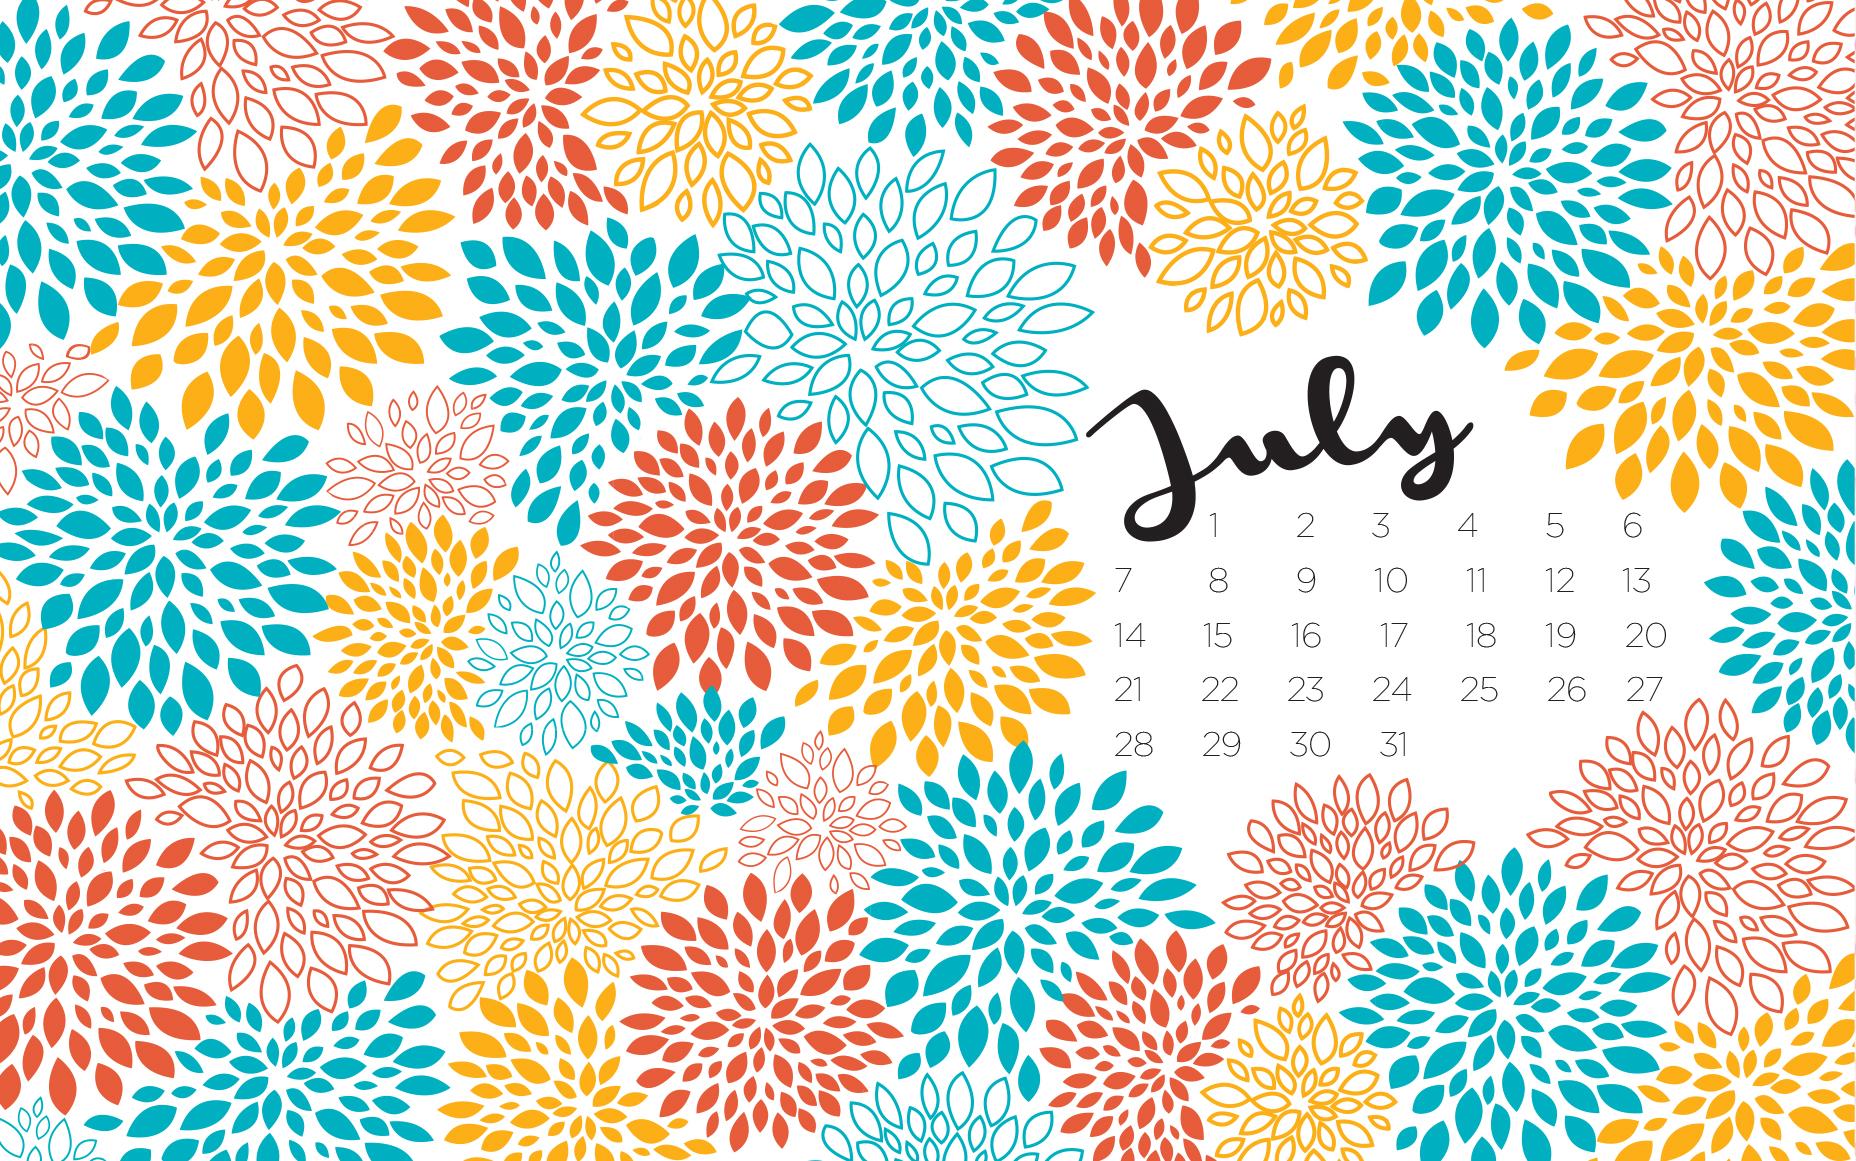 Calendar Wallpaper July : Free july wallpaper with calendar wallpapersafari